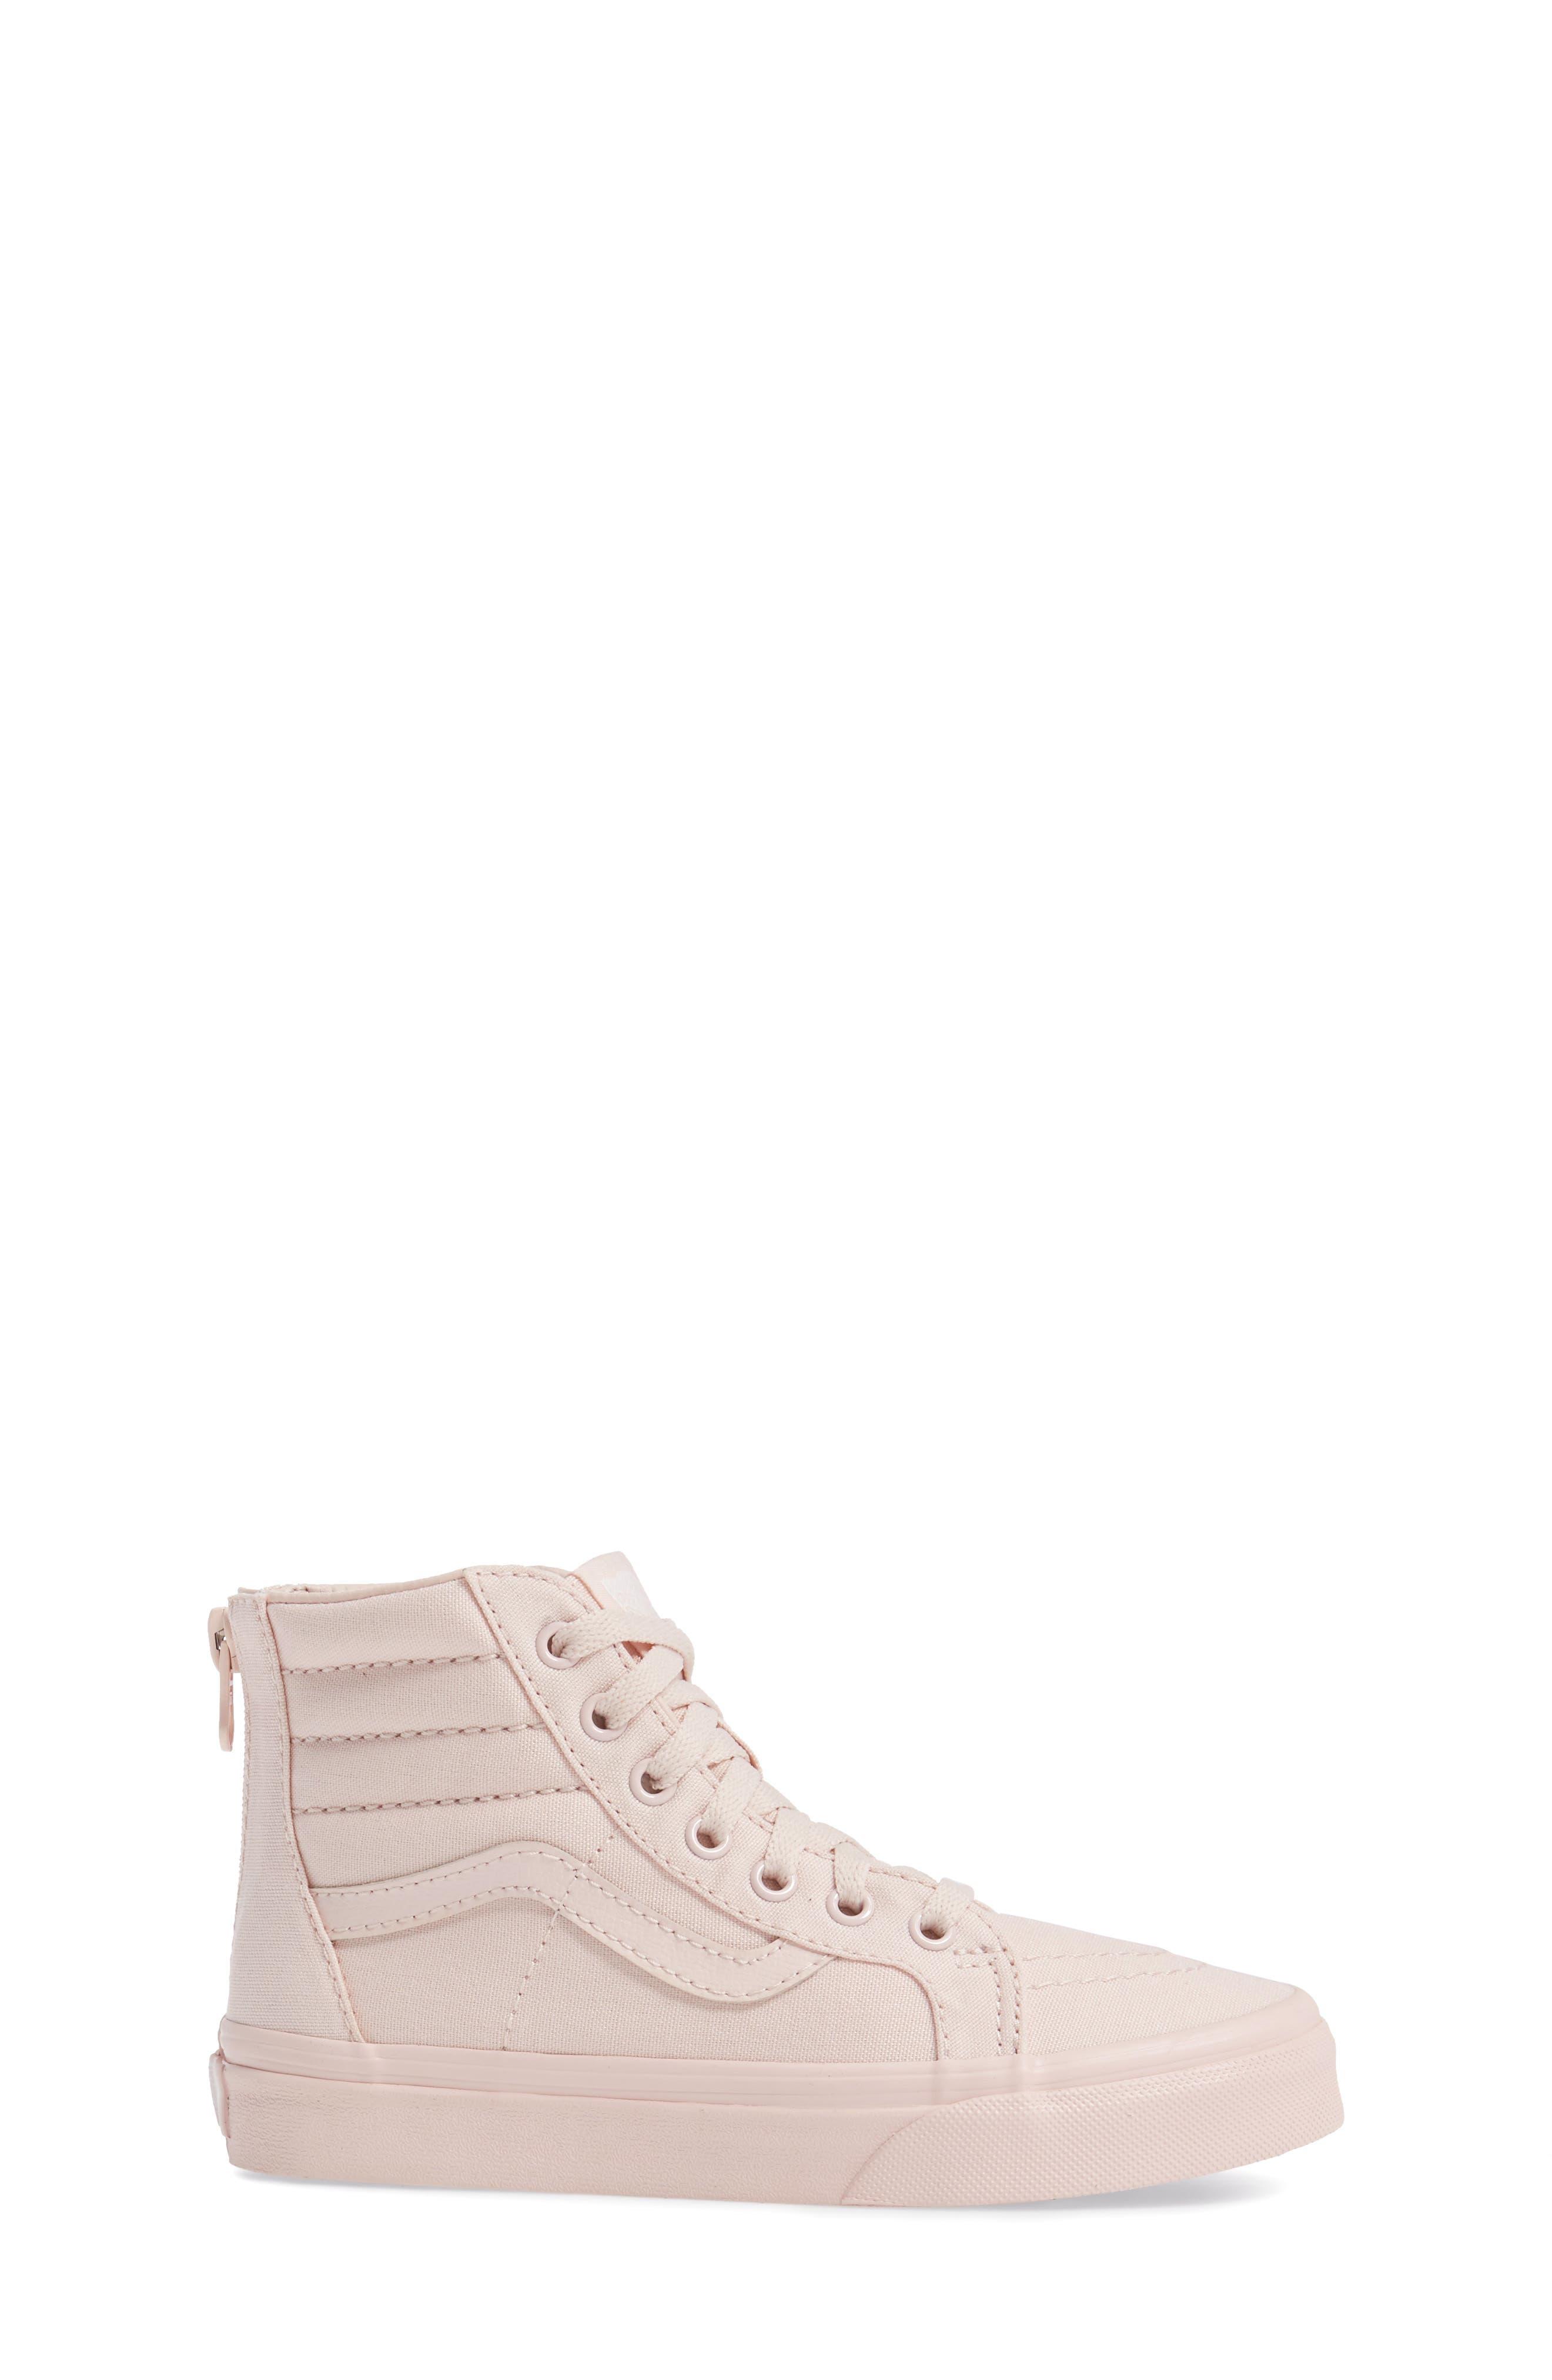 SK8-Hi Zip Sneaker,                             Alternate thumbnail 3, color,                             Peach Blush Canvas